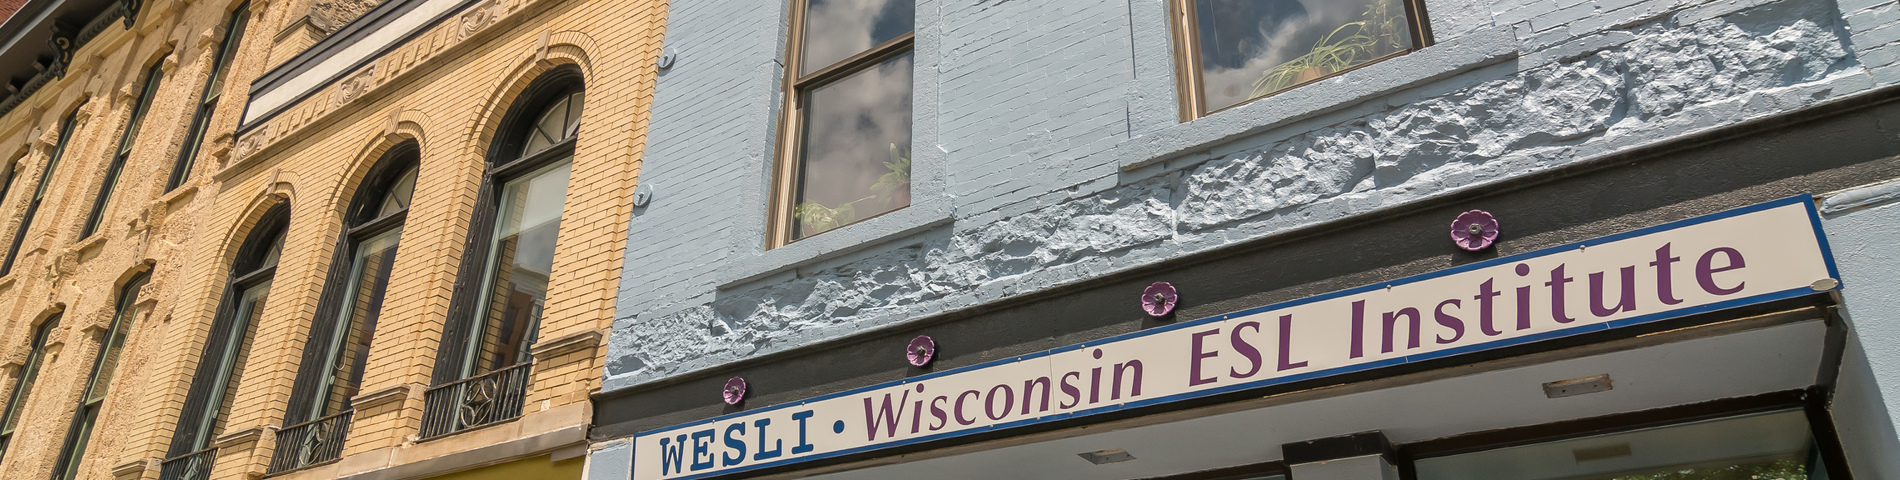 1 фотографий WESLI Wisconsin ESL Institute